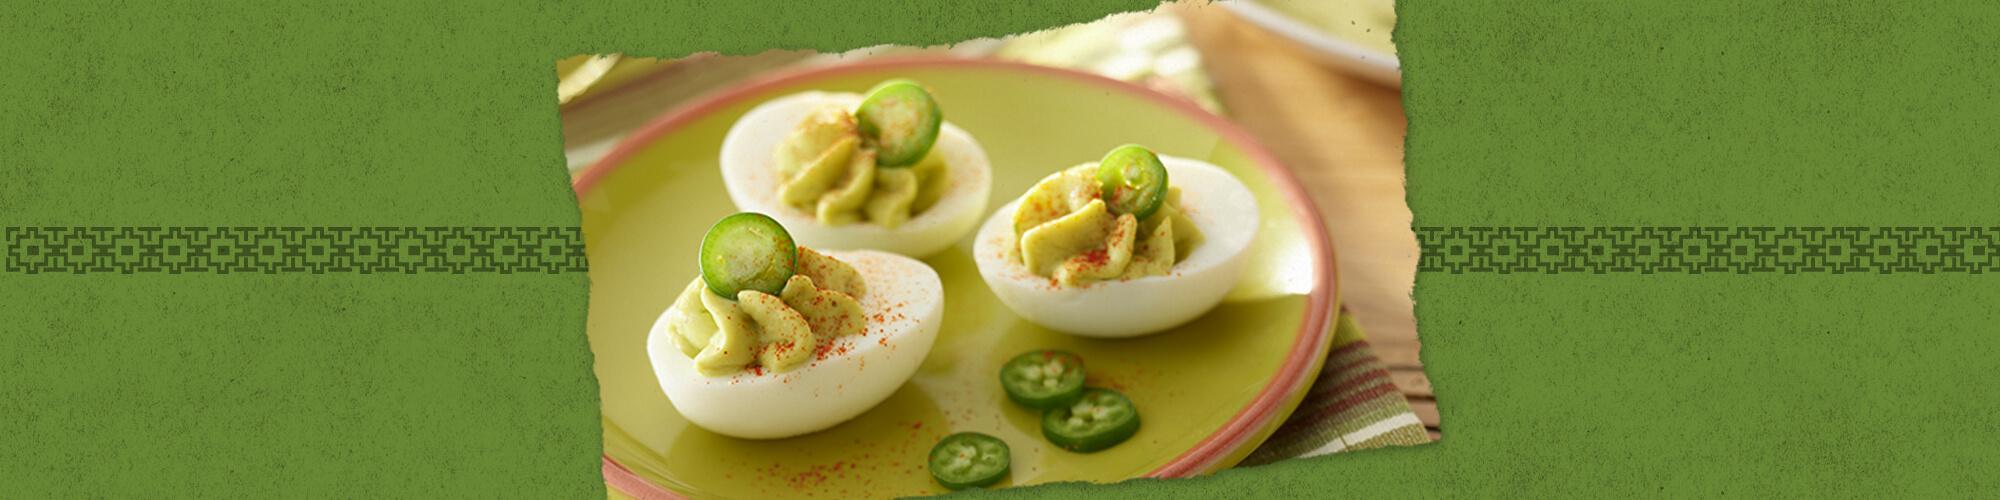 Salsas guacamole salsa deviled eggs